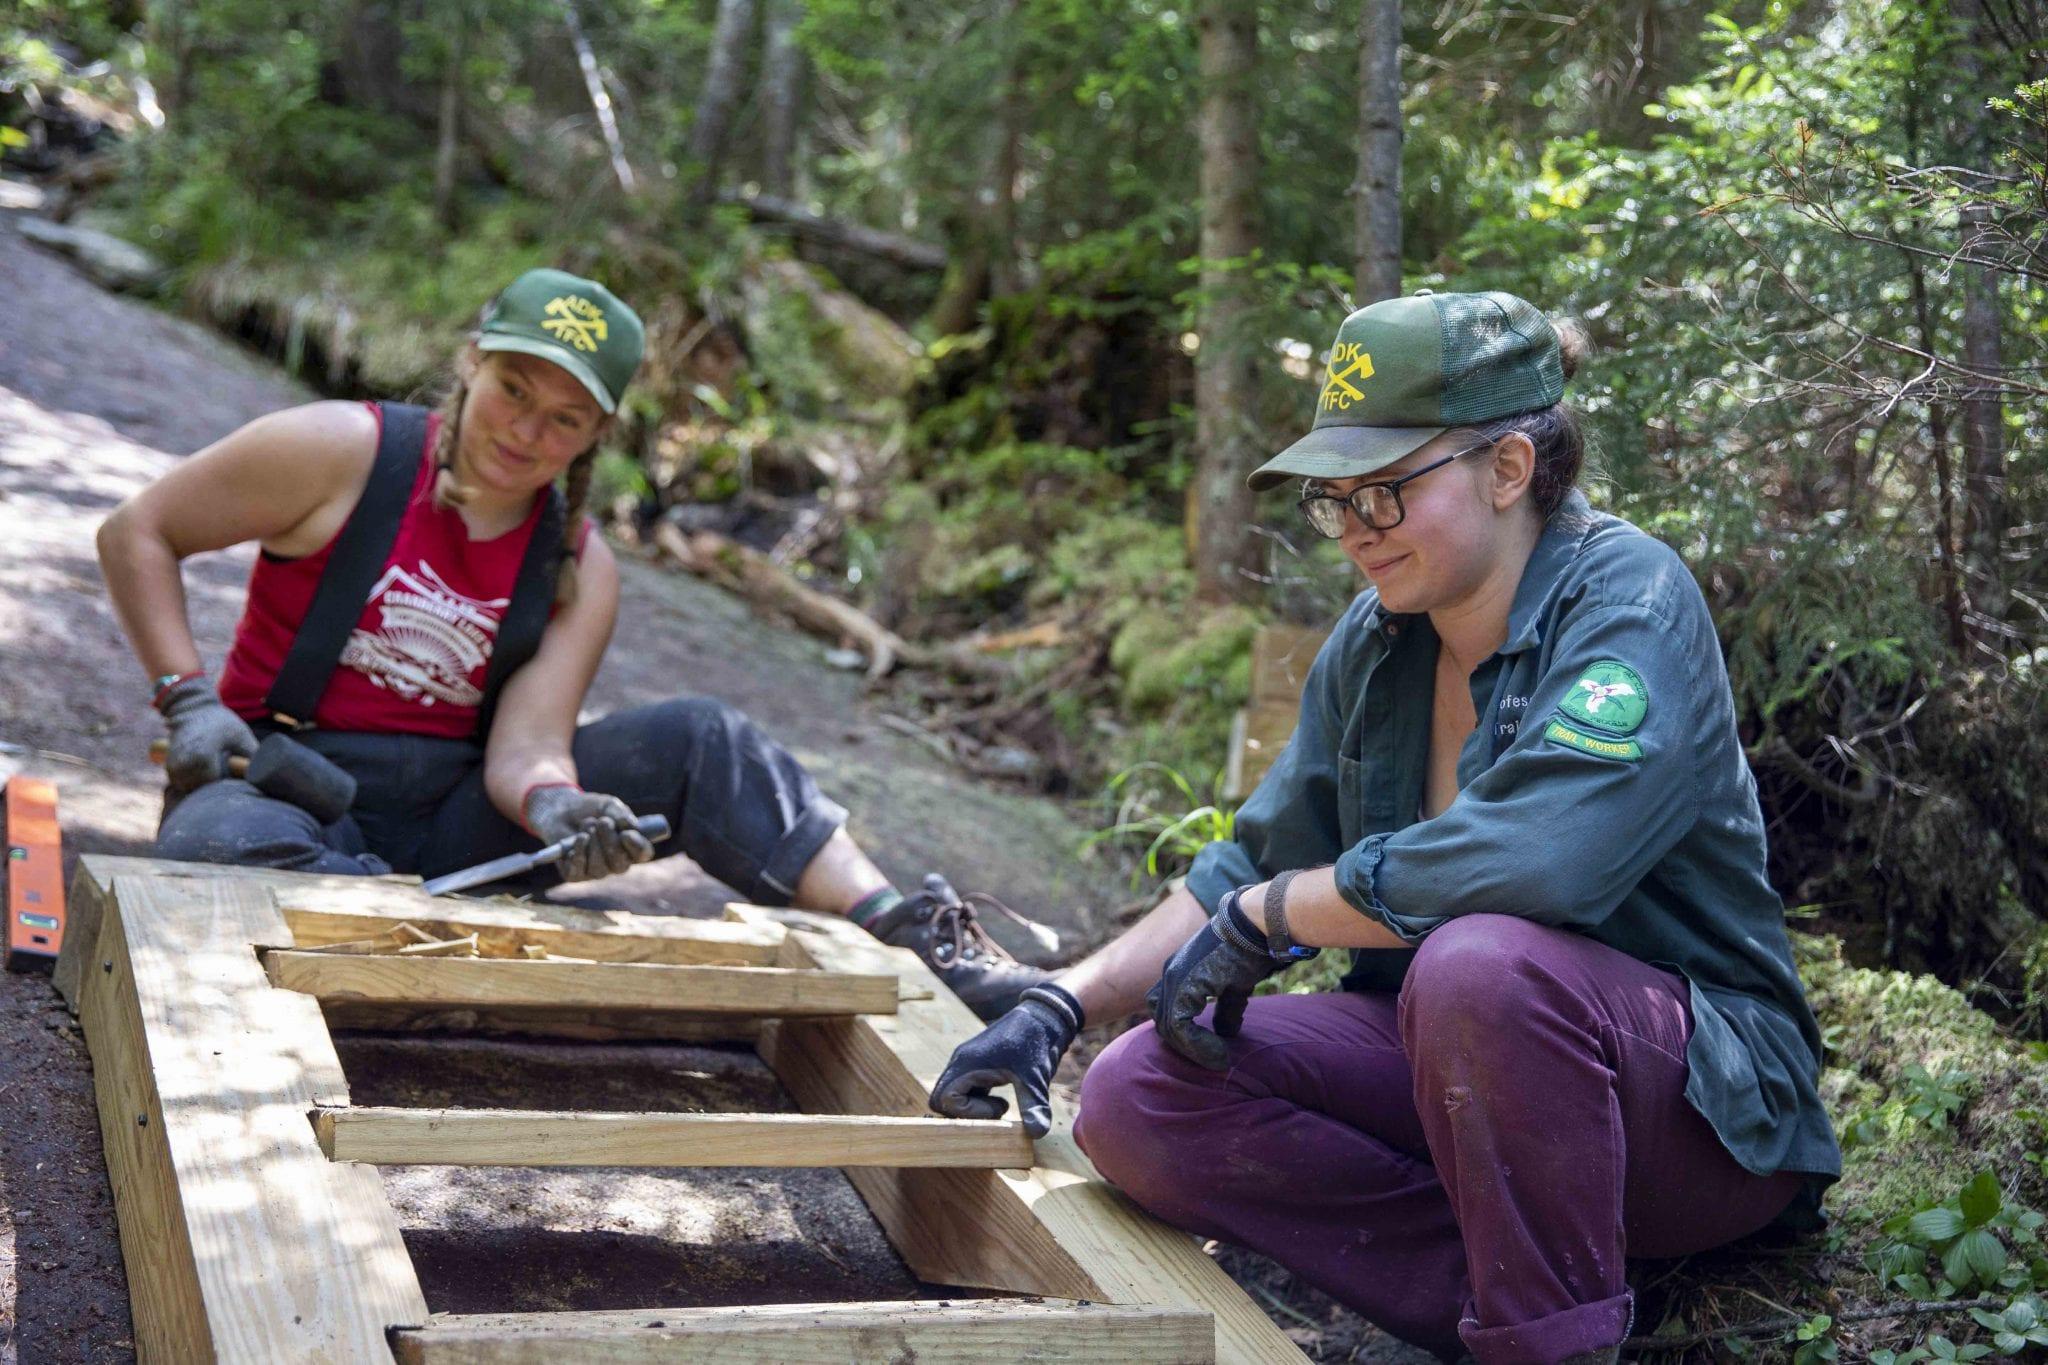 Trail work faces uncertain summer, as groups await guidance